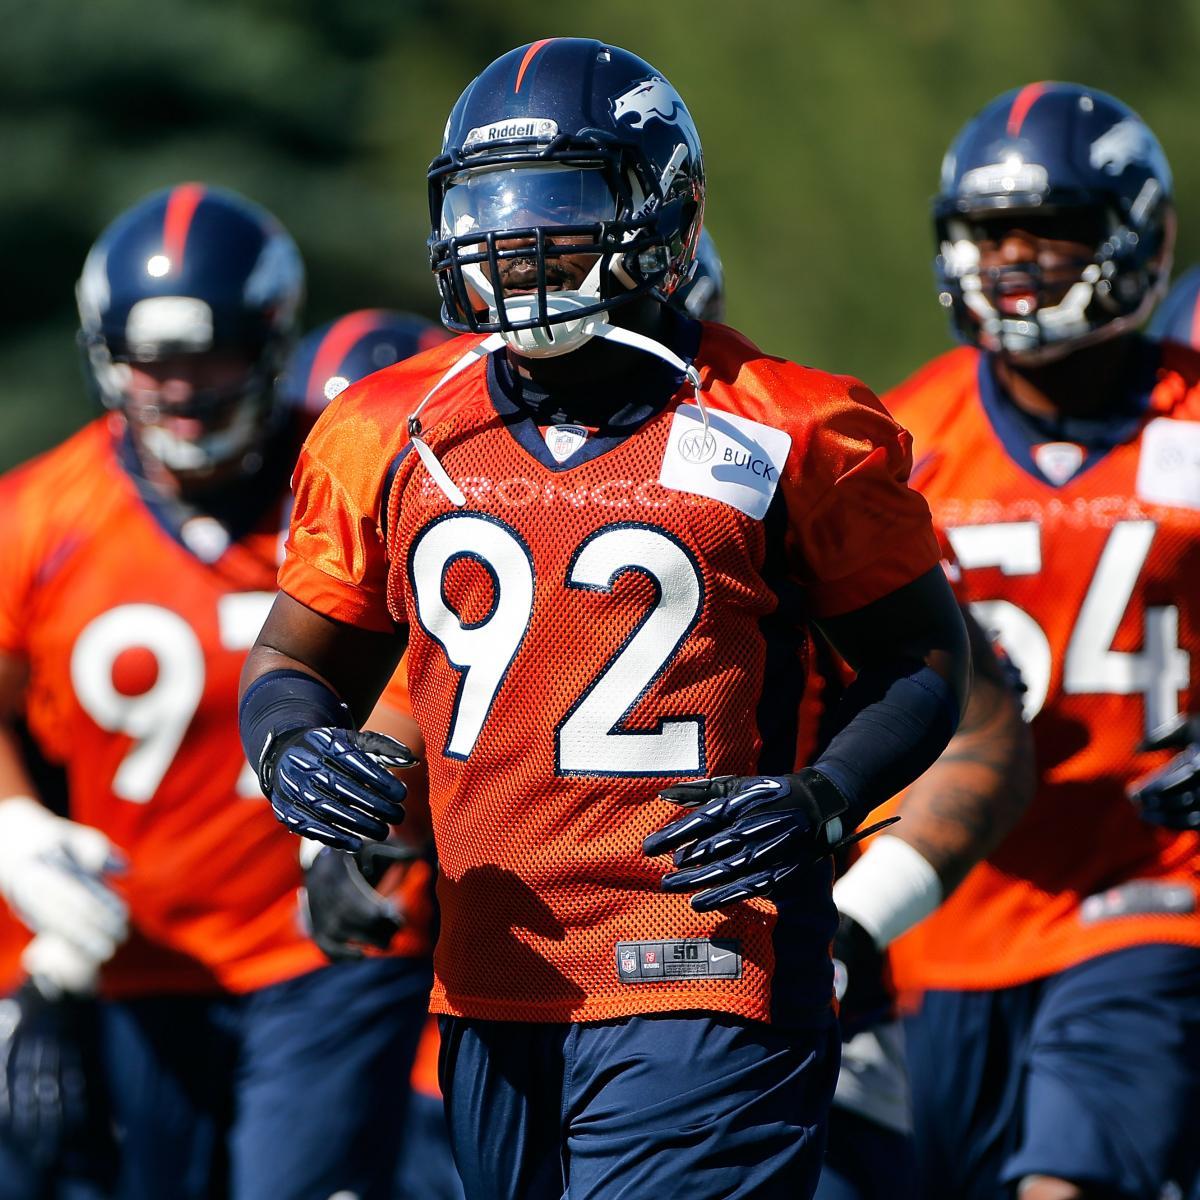 Denver Broncos Re Grading Their Key 2013 Offseason